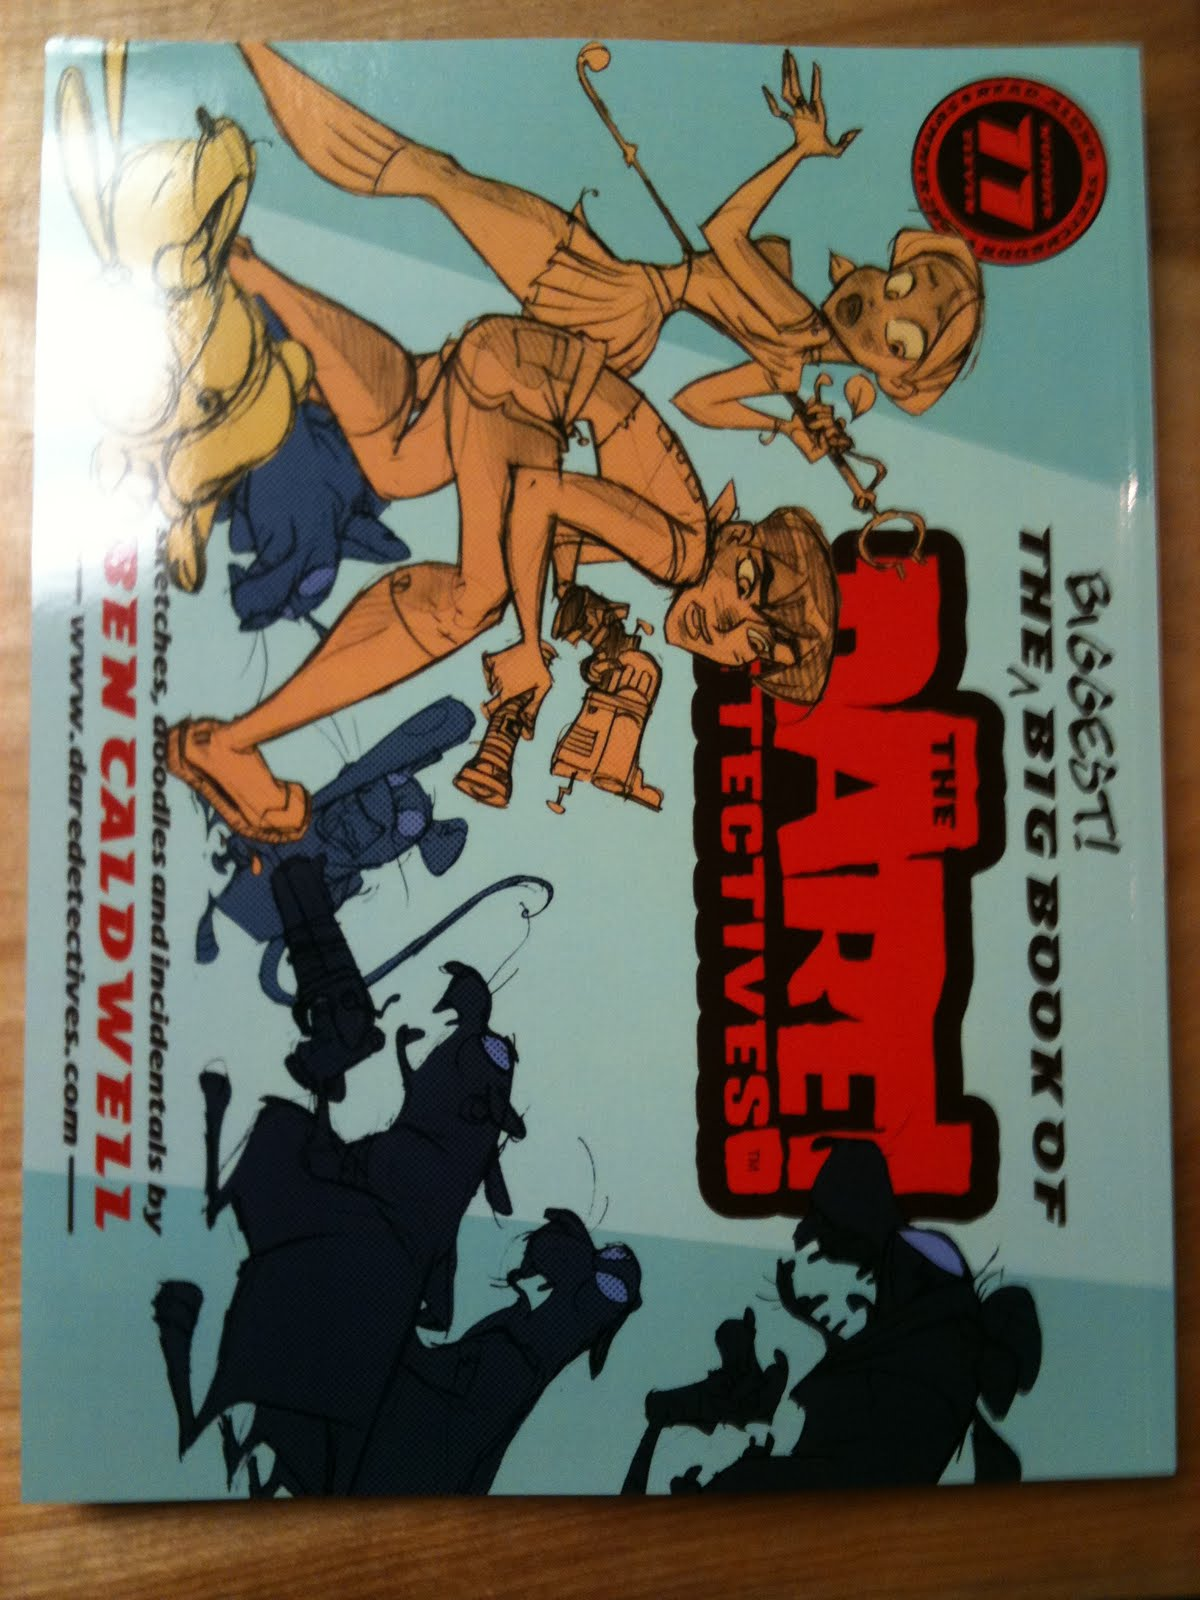 LABYRINTH BOOKS Toronto Comics MANGA and GRAPHIC NOVELS